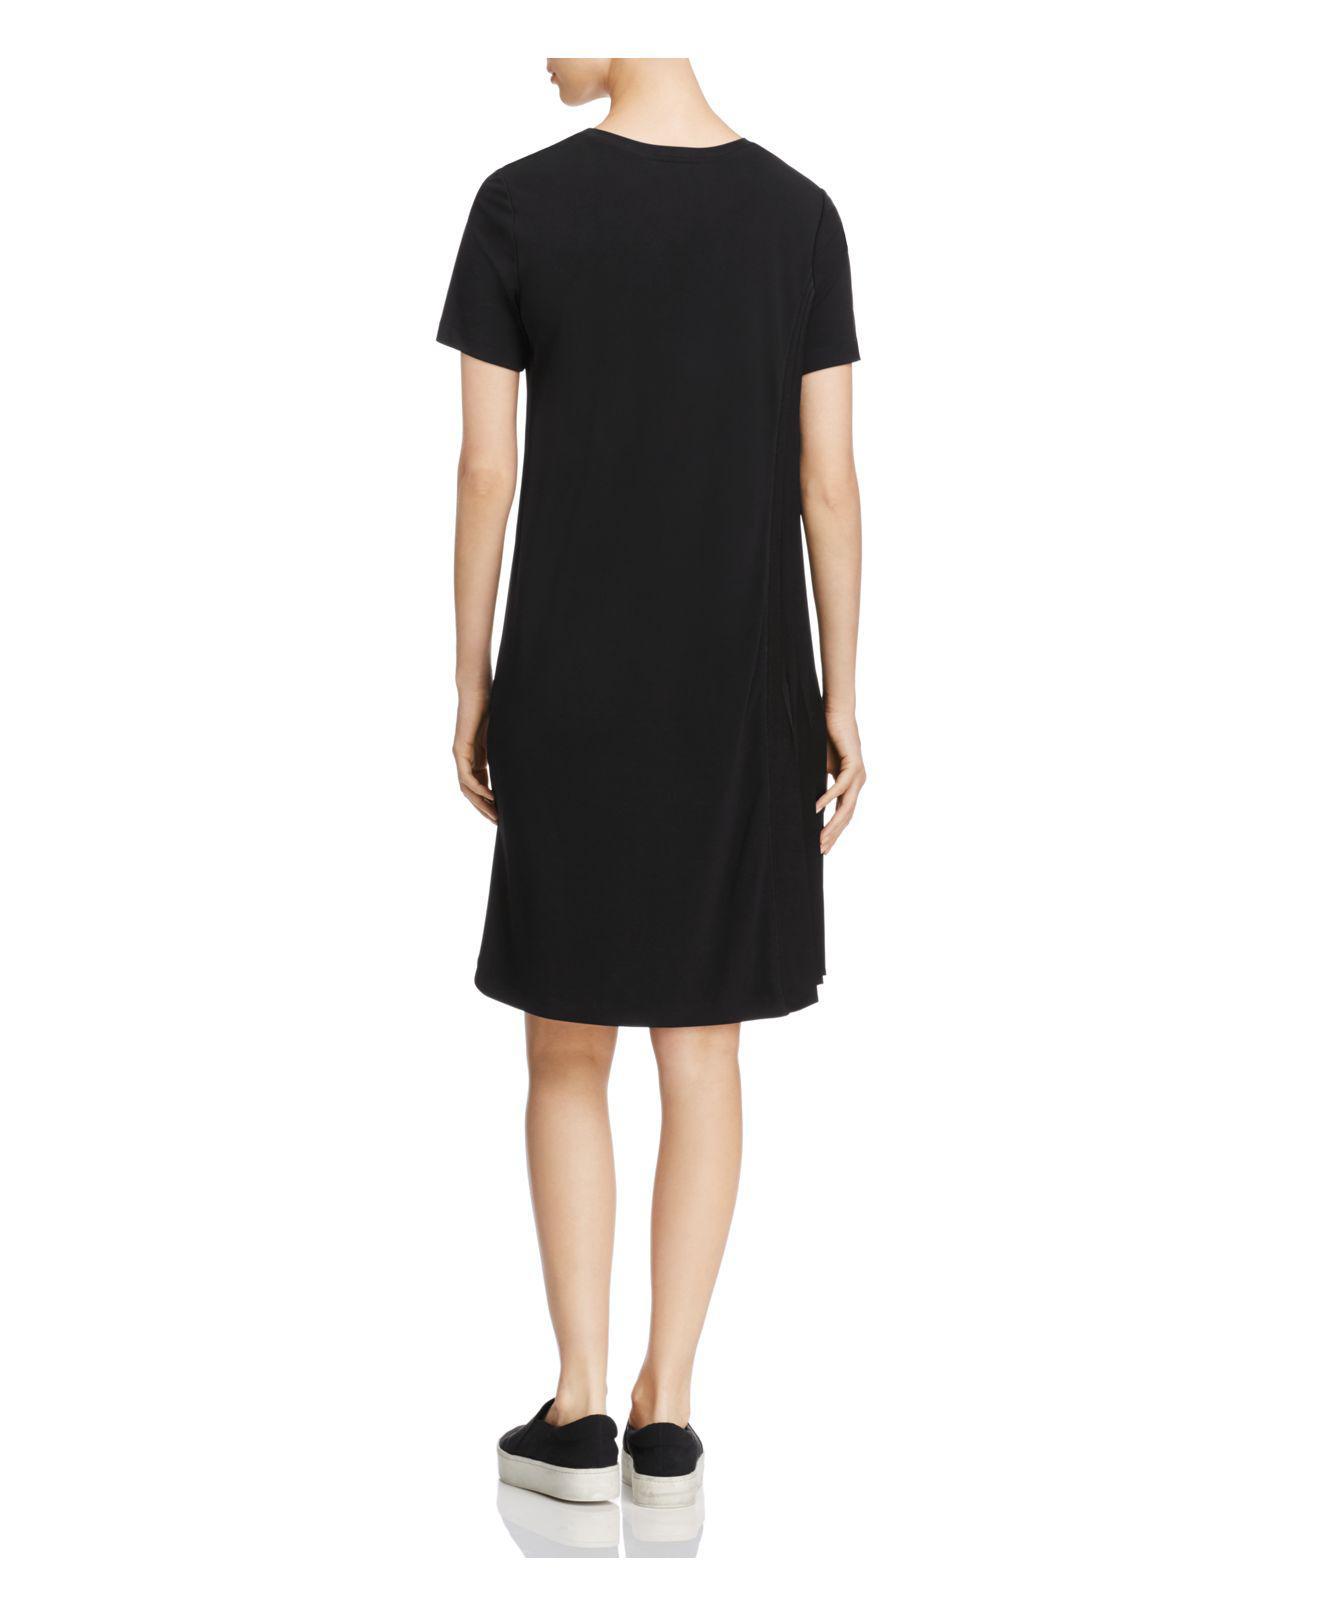 423568fe5b6 DKNY Short Sleeve Asymmetric-pleat Dress in Black - Lyst